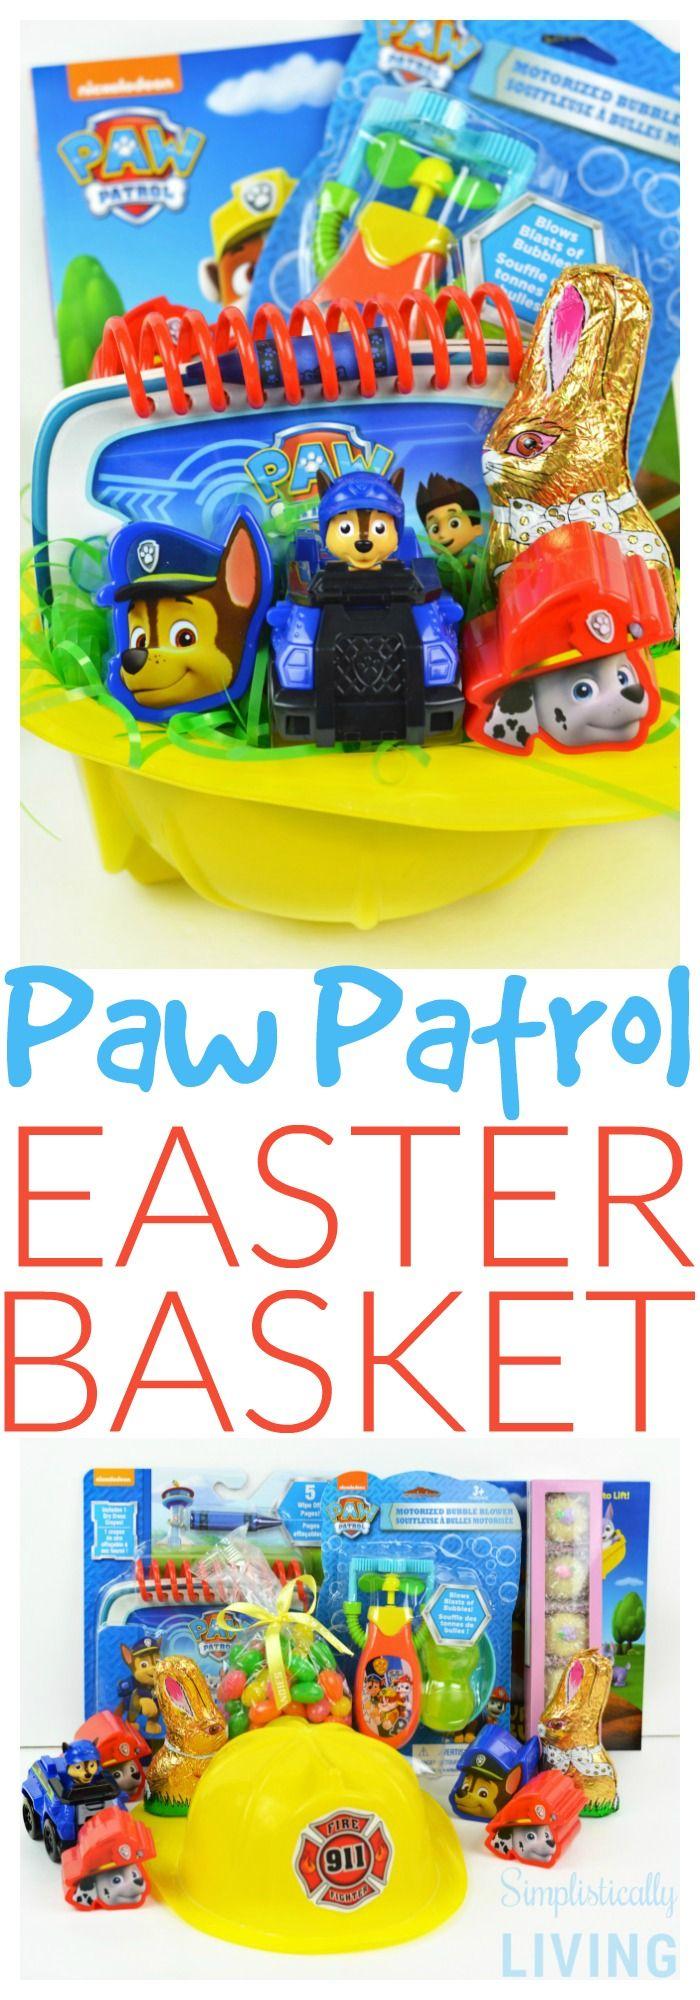 DIY Paw Patrol Easter Basket (For a Toddler) Simplistically Living #SeesCandies @seescandies